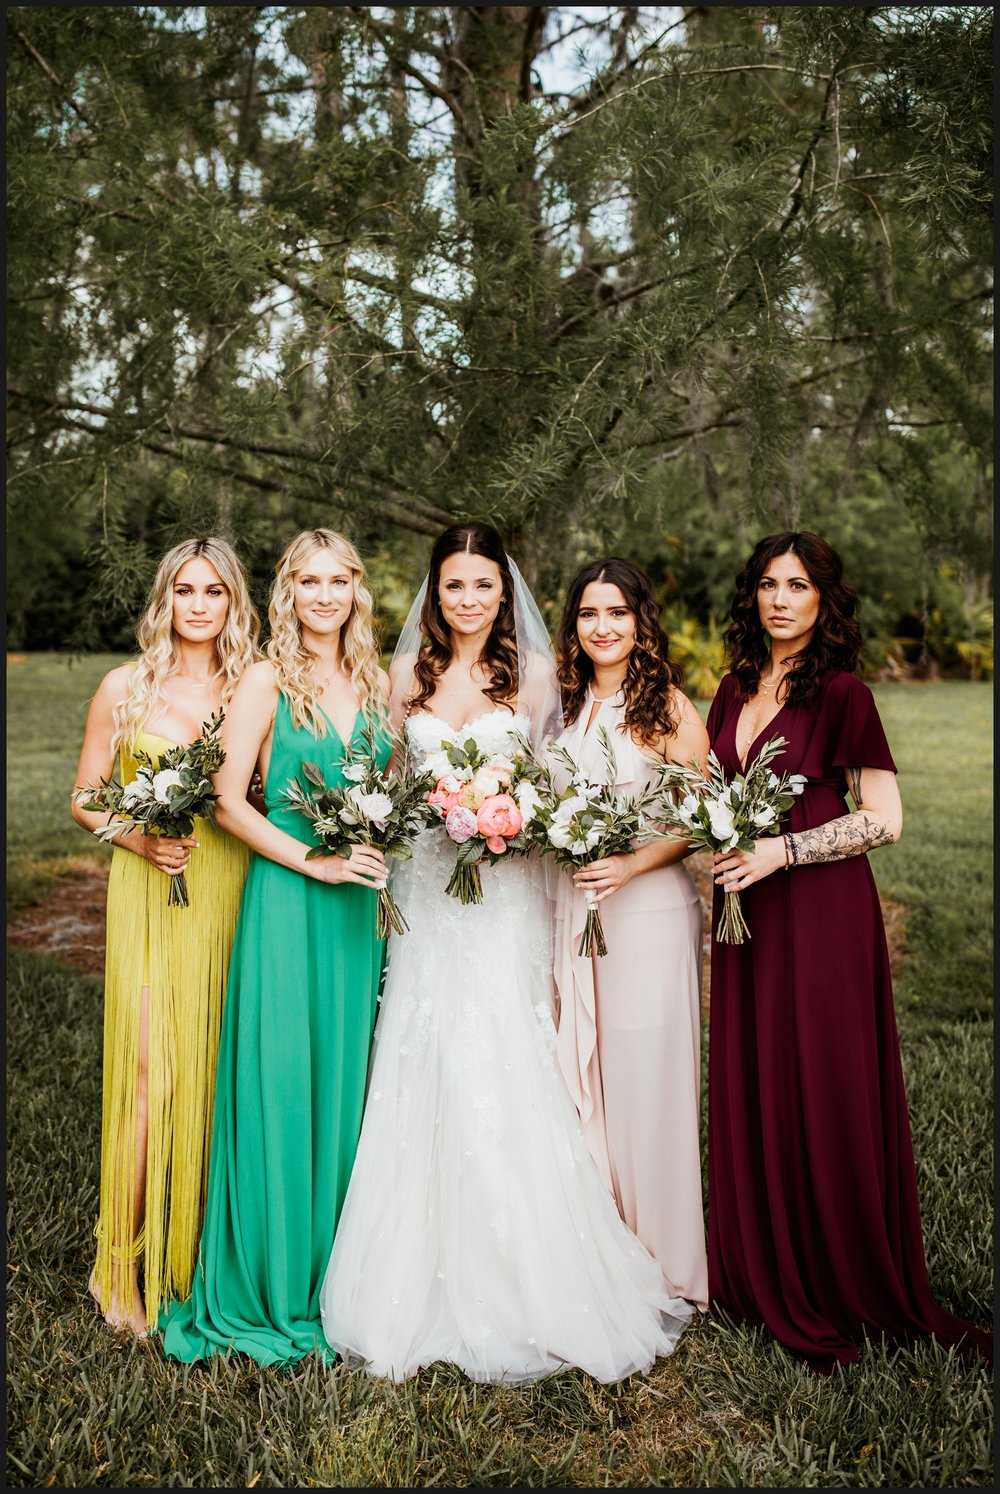 Orlando-Wedding-Photographer-destination-wedding-photographer-florida-wedding-photographer-hawaii-wedding-photographer_0208.jpg